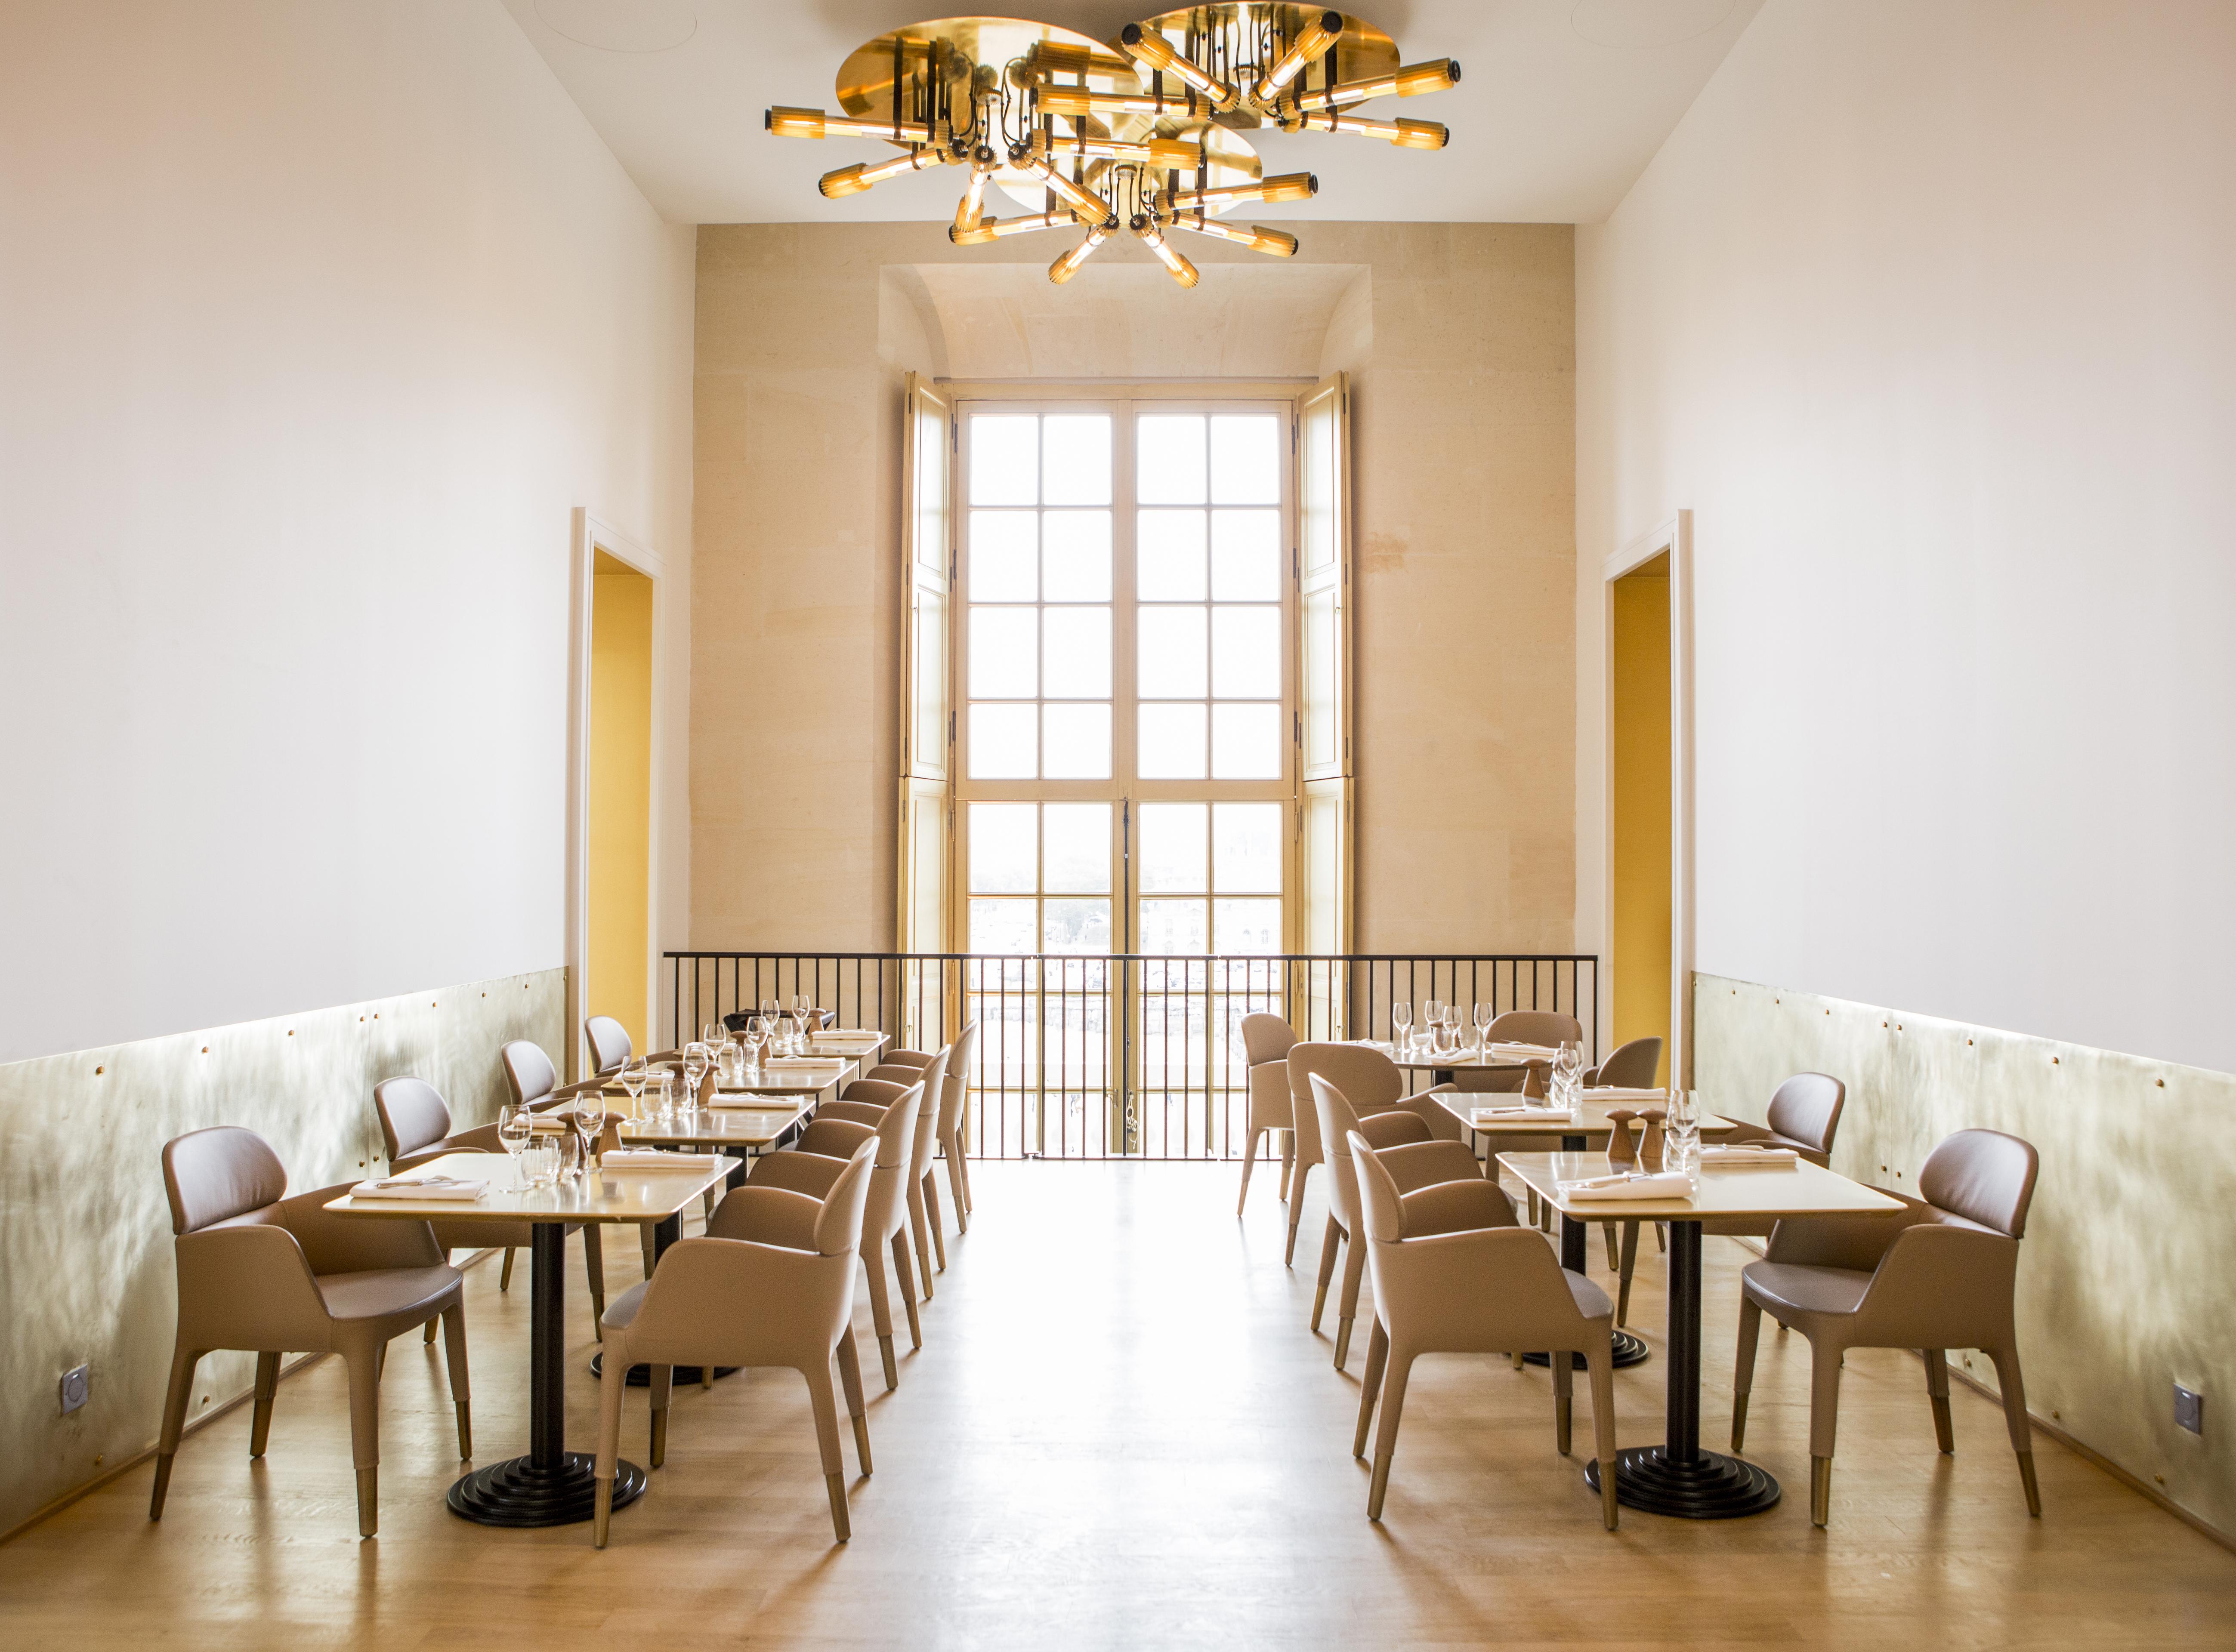 Ore, dining room @Pierre Monetta